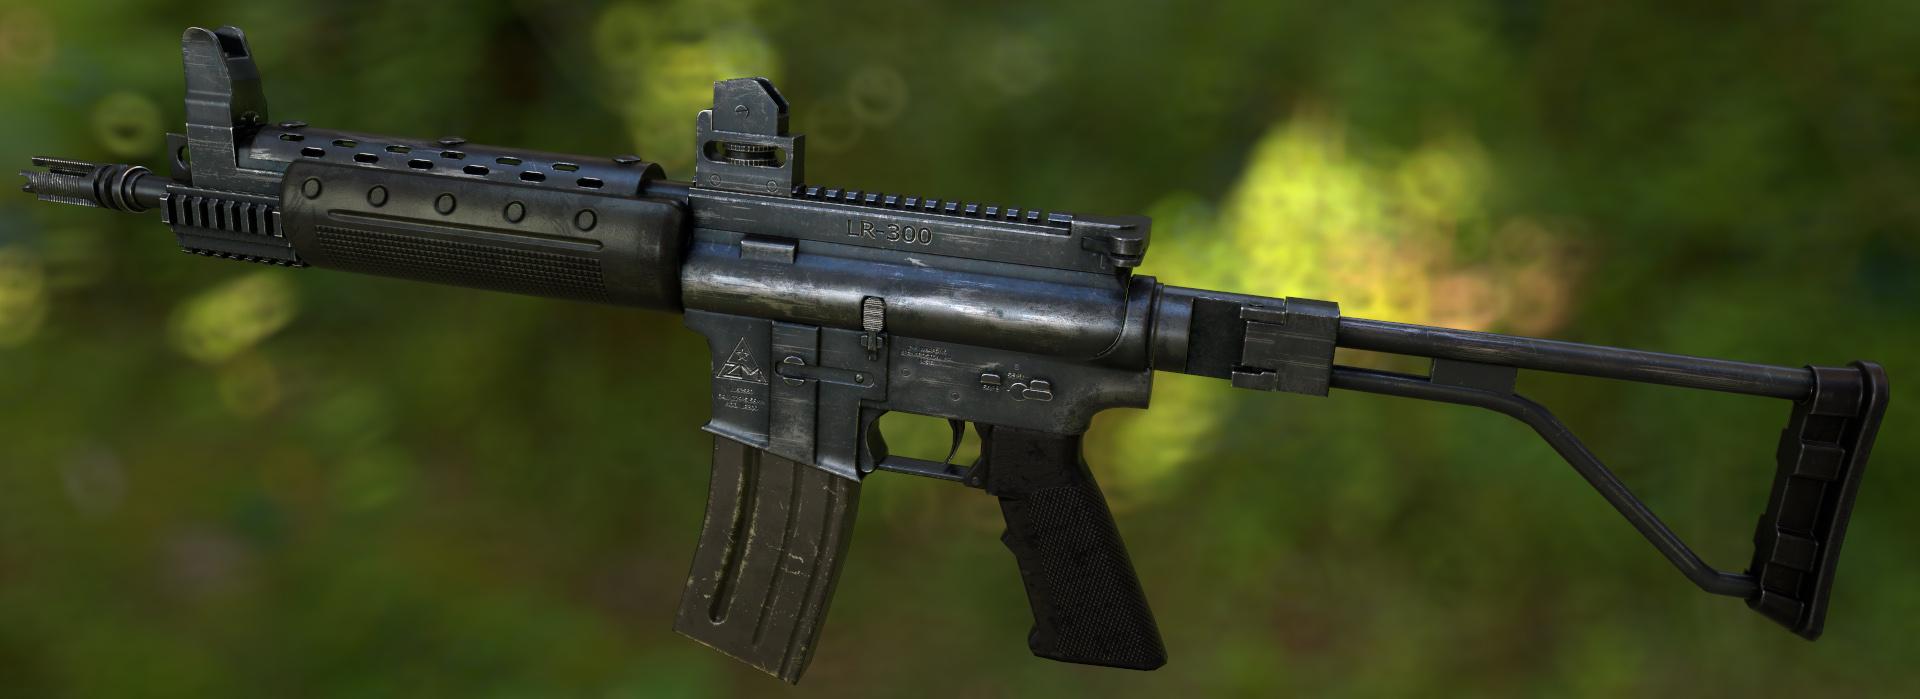 LR300 models image - L.U.R.K. mod for S.T.A.L.K.E.R